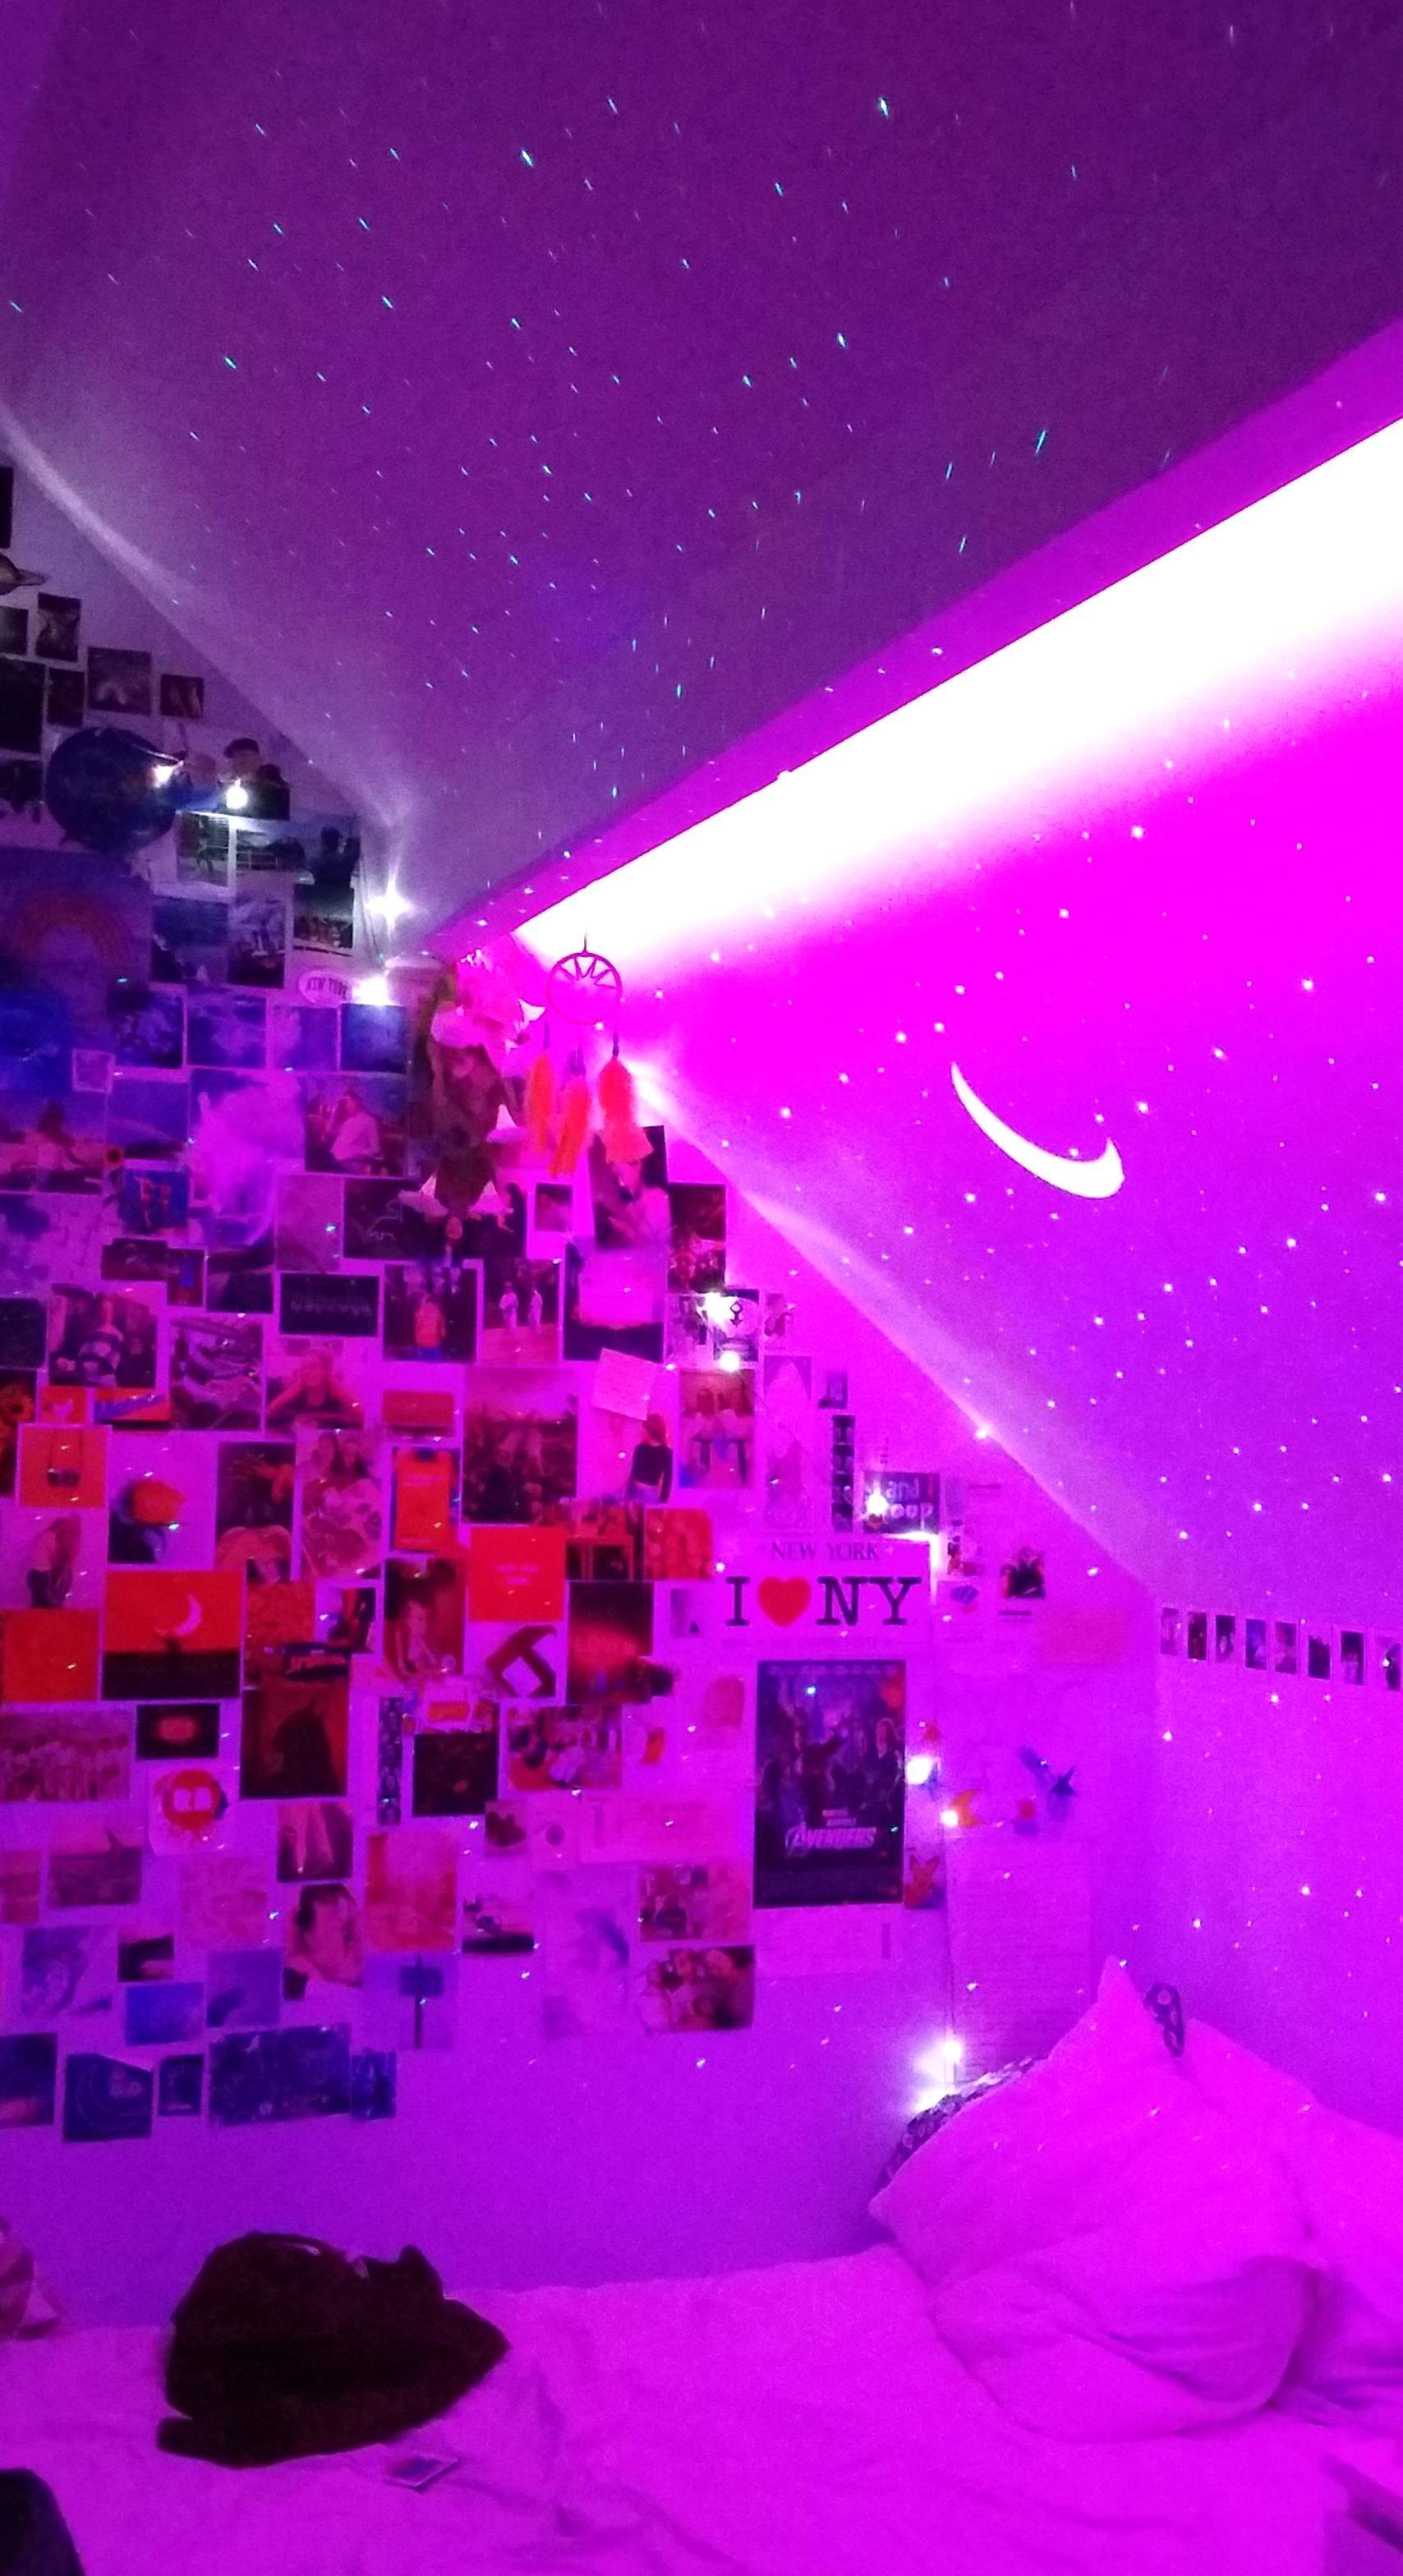 Aesthetic Tik Tok Room Led Lights Collage Wall Vsco Room Skylite Projector Bedroom Inspo In 2020 Neon Room Room Inspiration Bedroom Indie Room